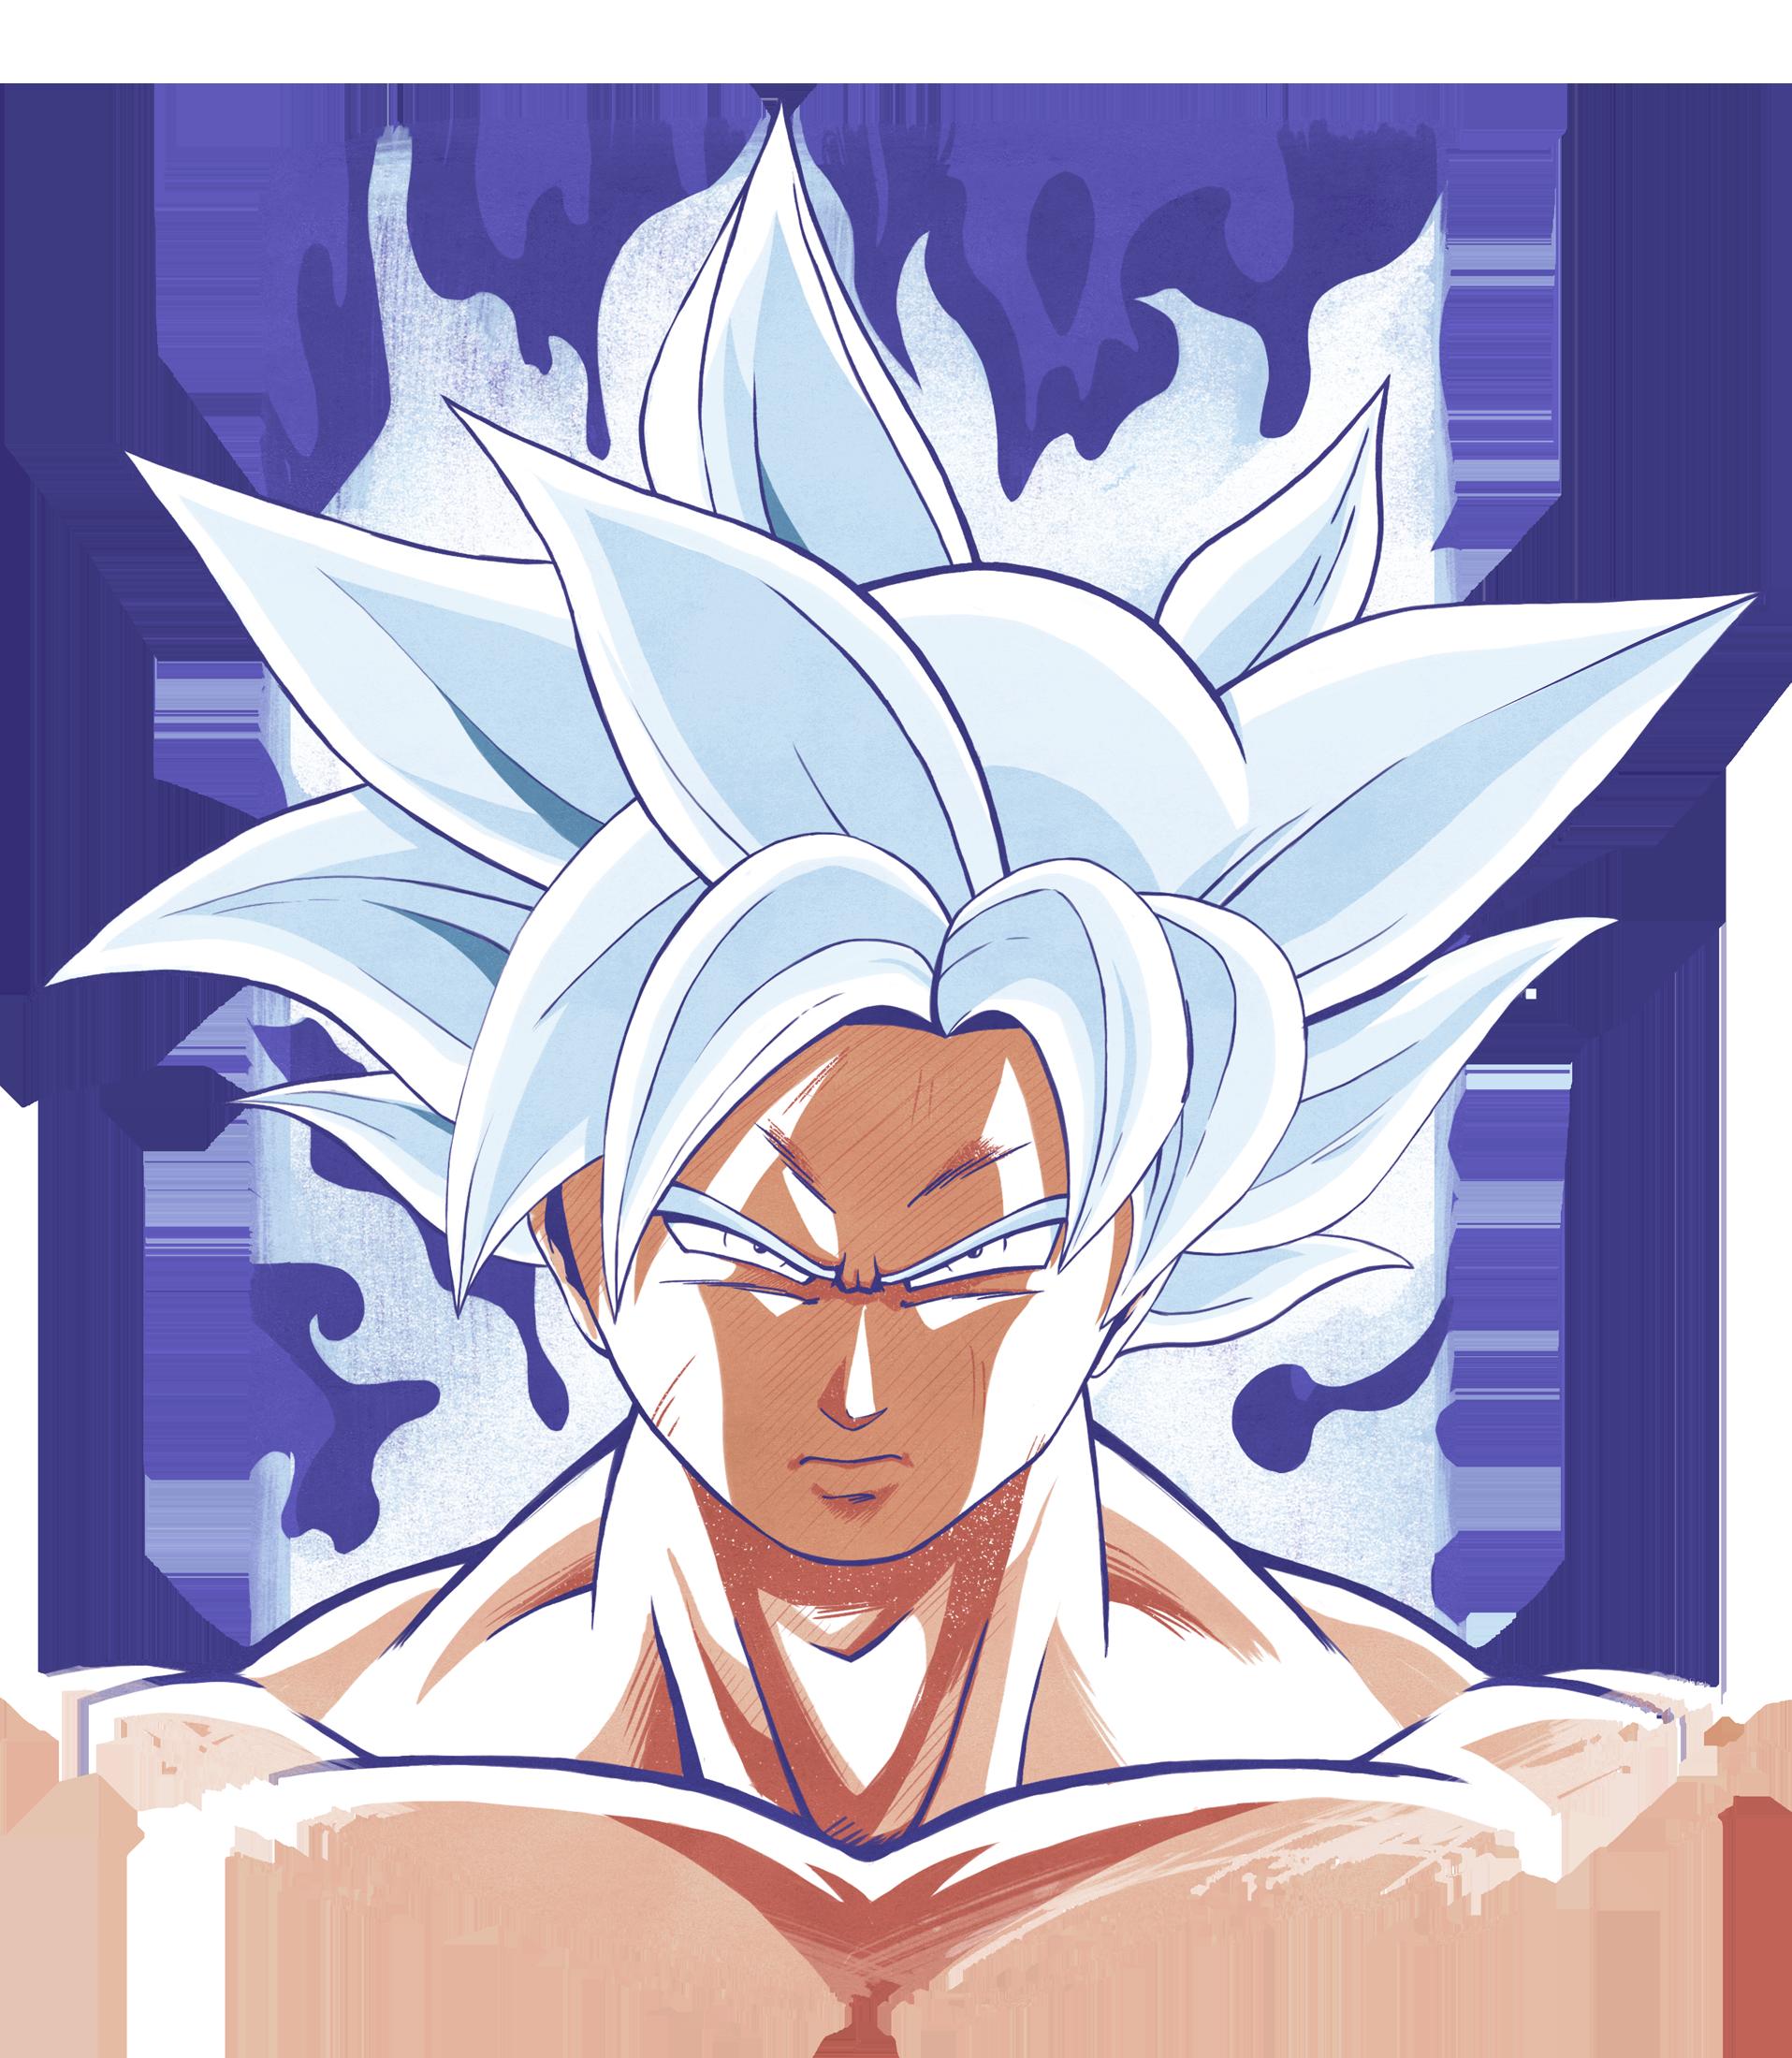 Goku Ultra Instinct Shirt Dragonball Ultrainstinct Gokuultrainstinct Dragon Ball Z Dragon Ball Super Anime